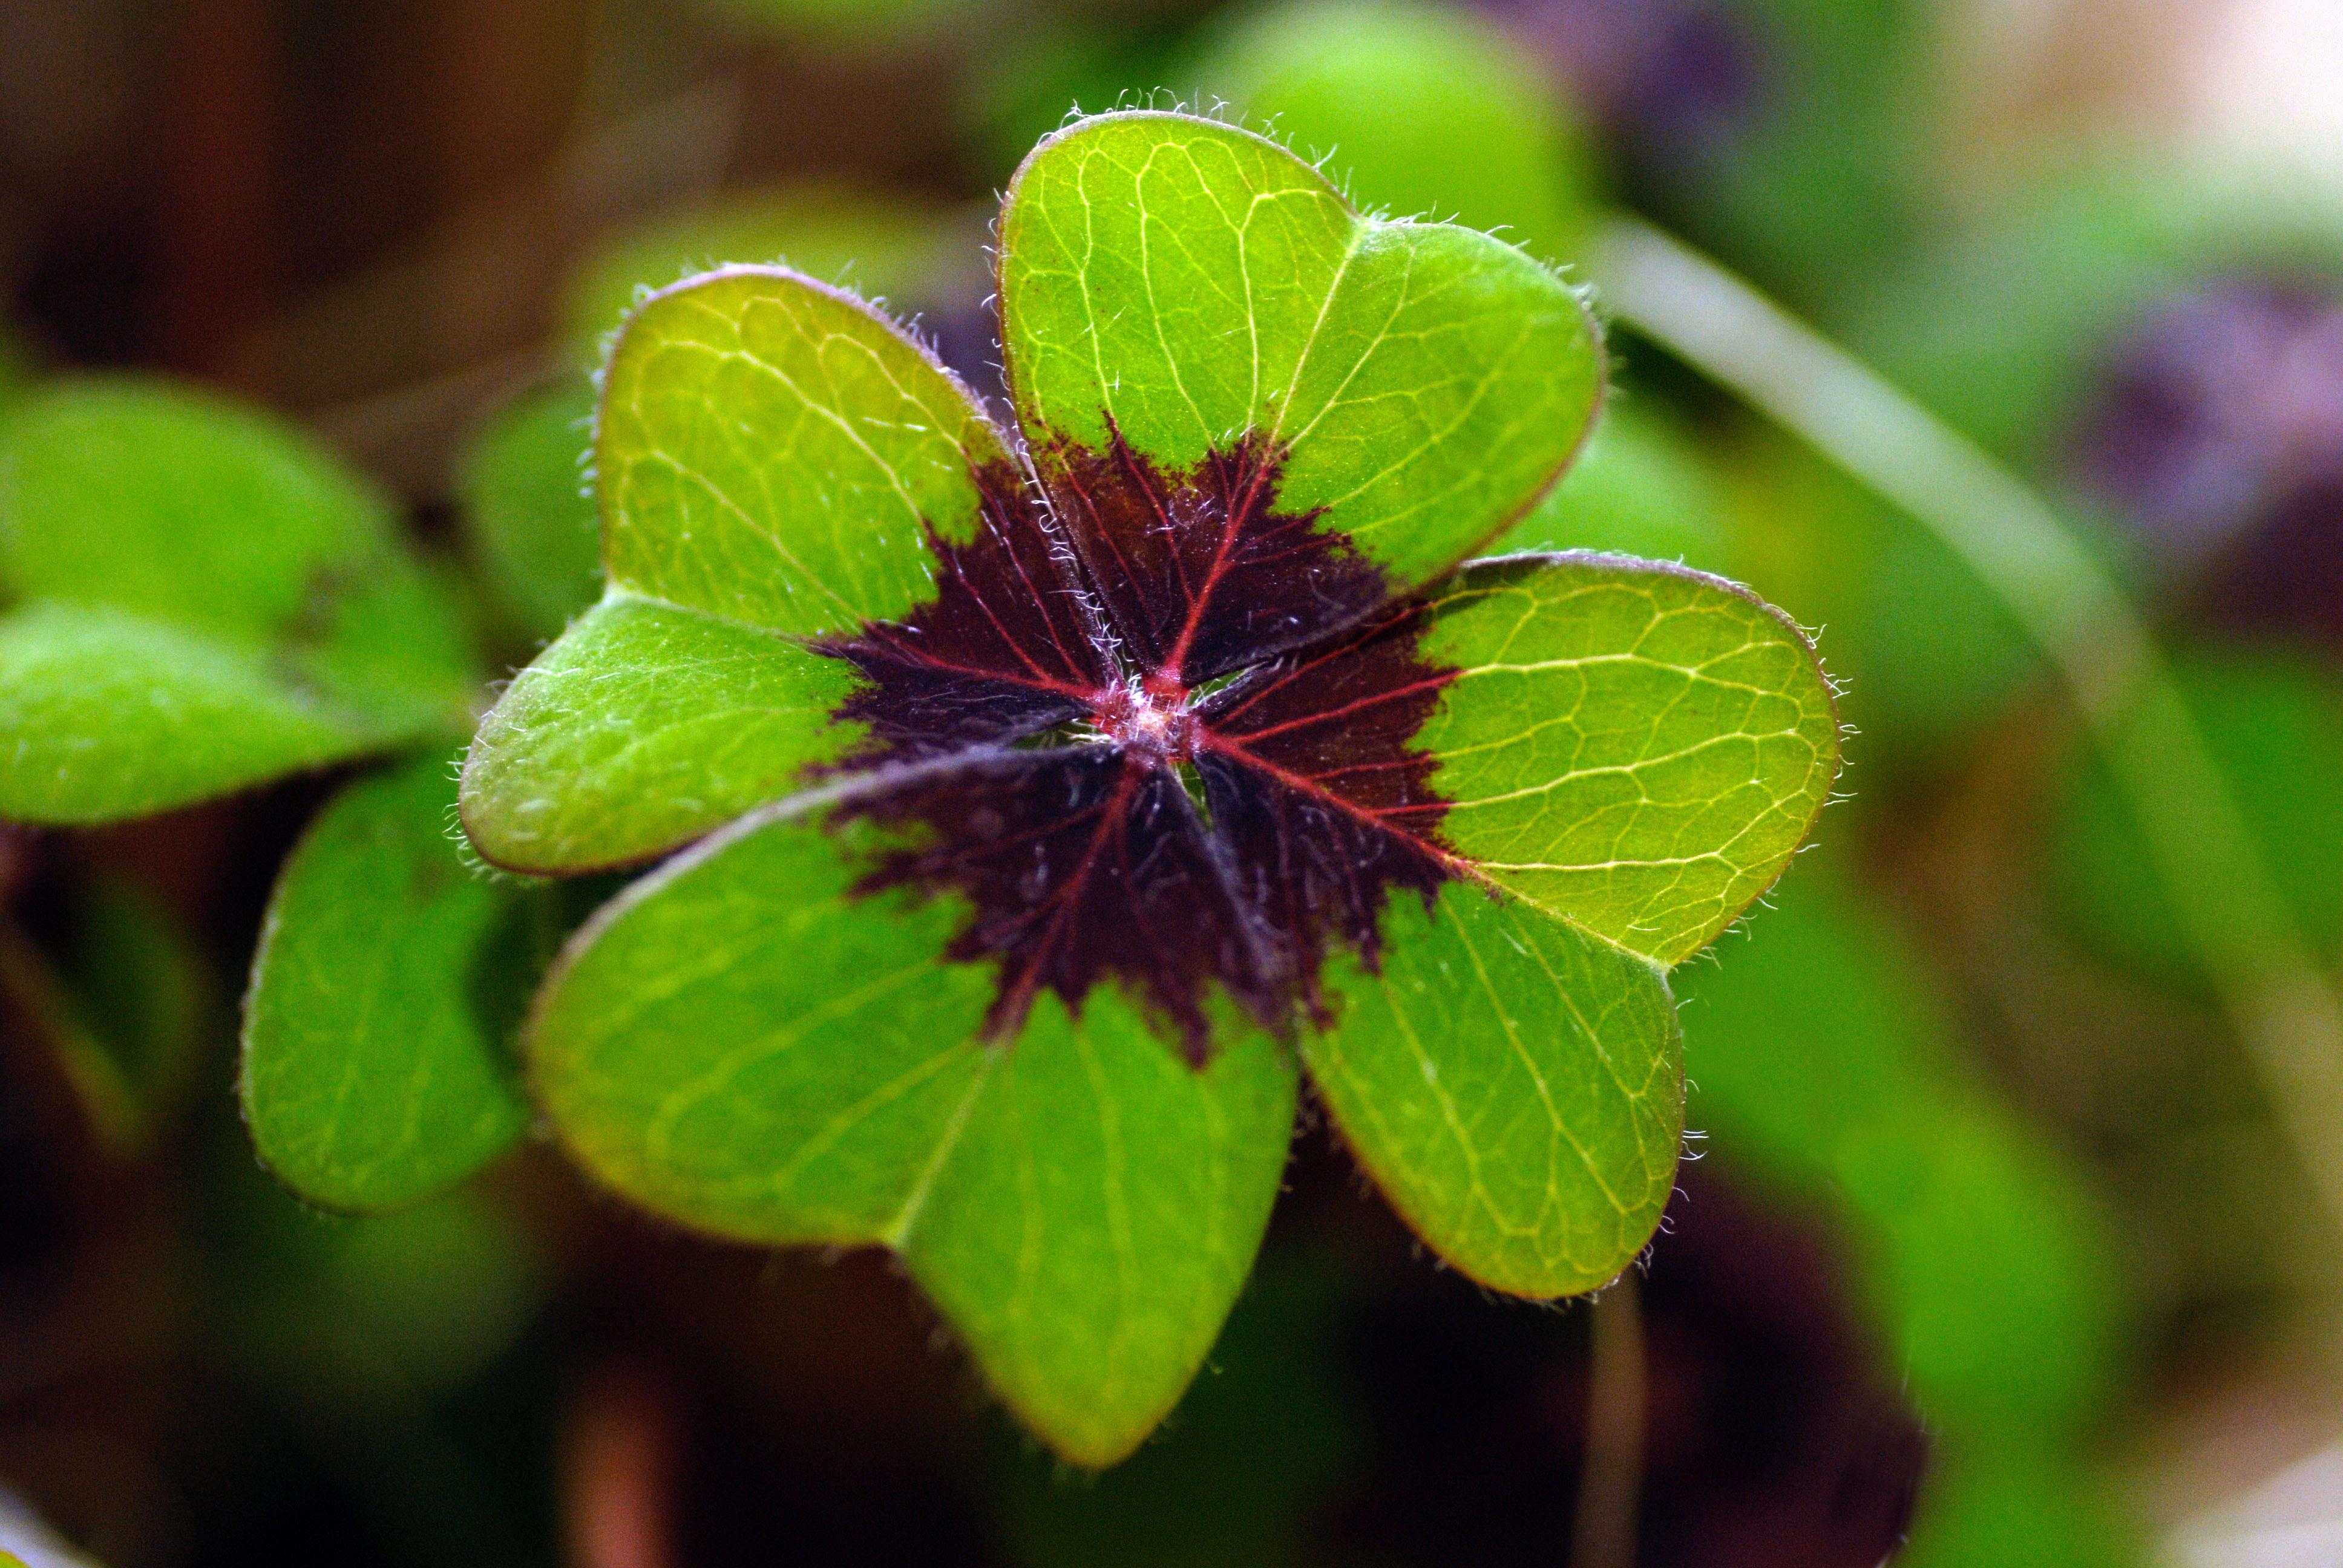 Oxalis_tetraphylla_Blatt.jpg